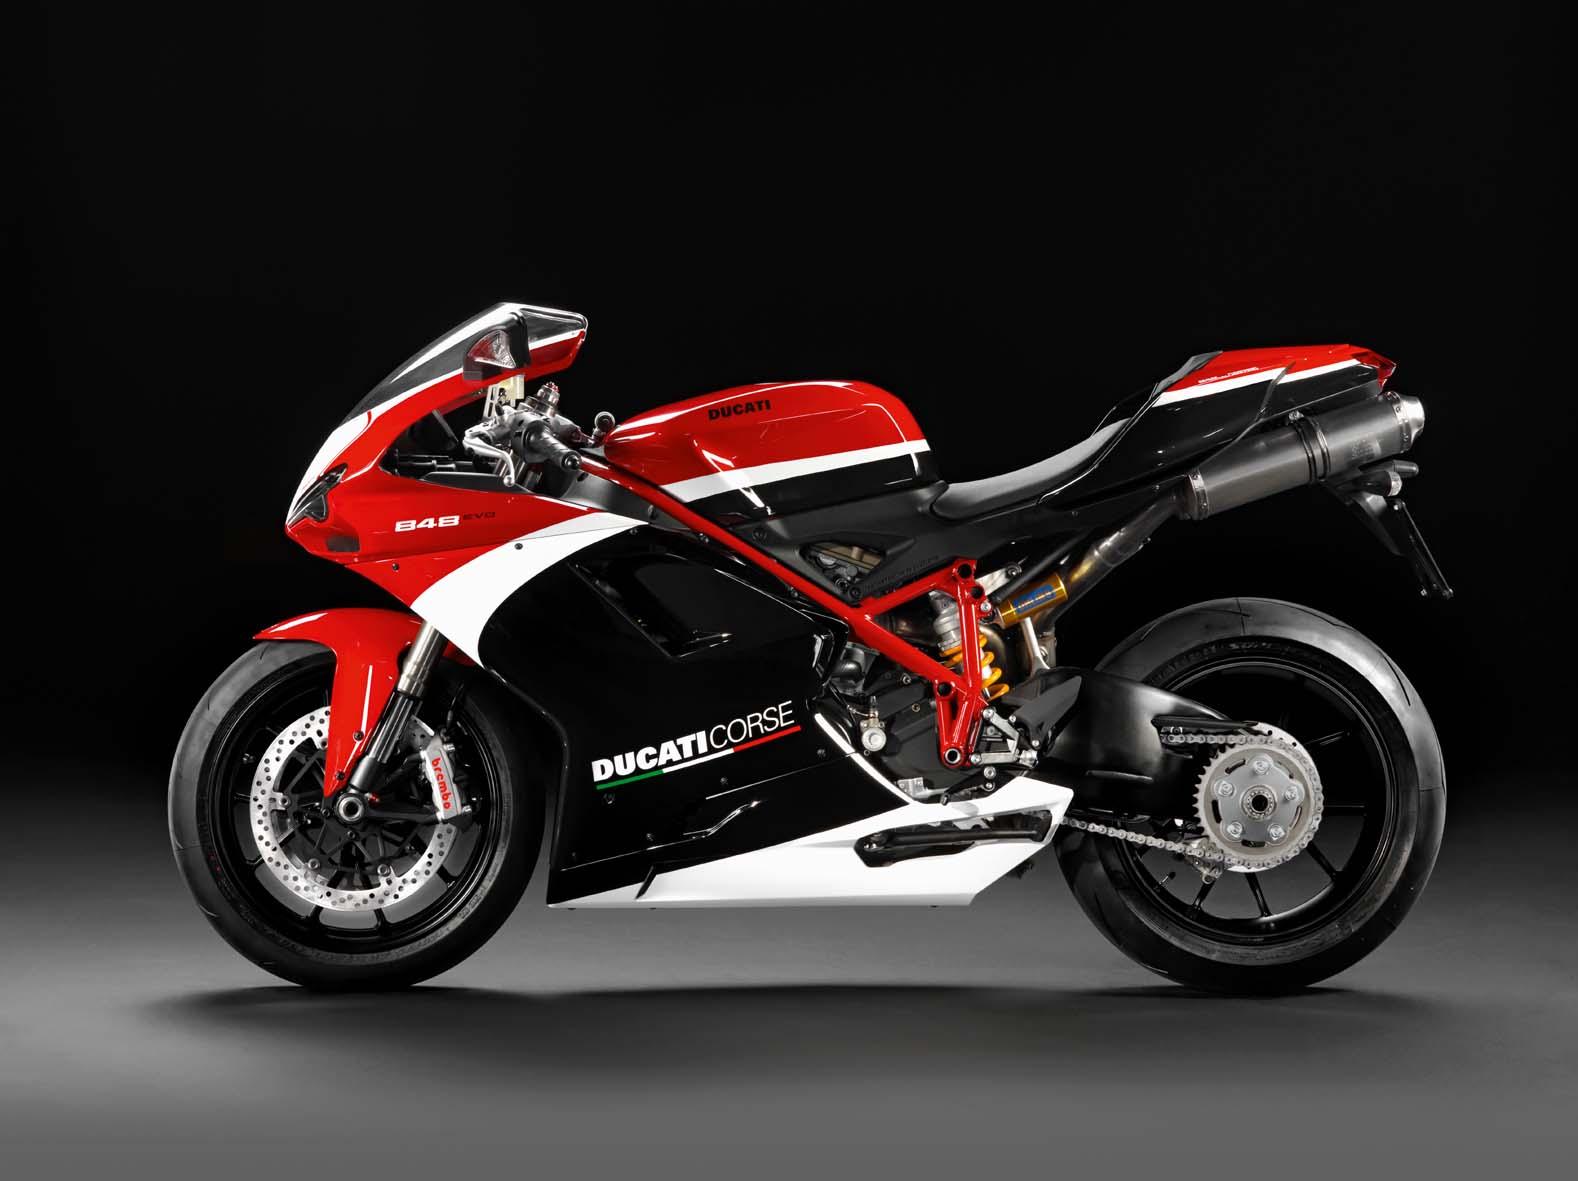 2012 ducati superbike 848 evo corse special edition. Black Bedroom Furniture Sets. Home Design Ideas